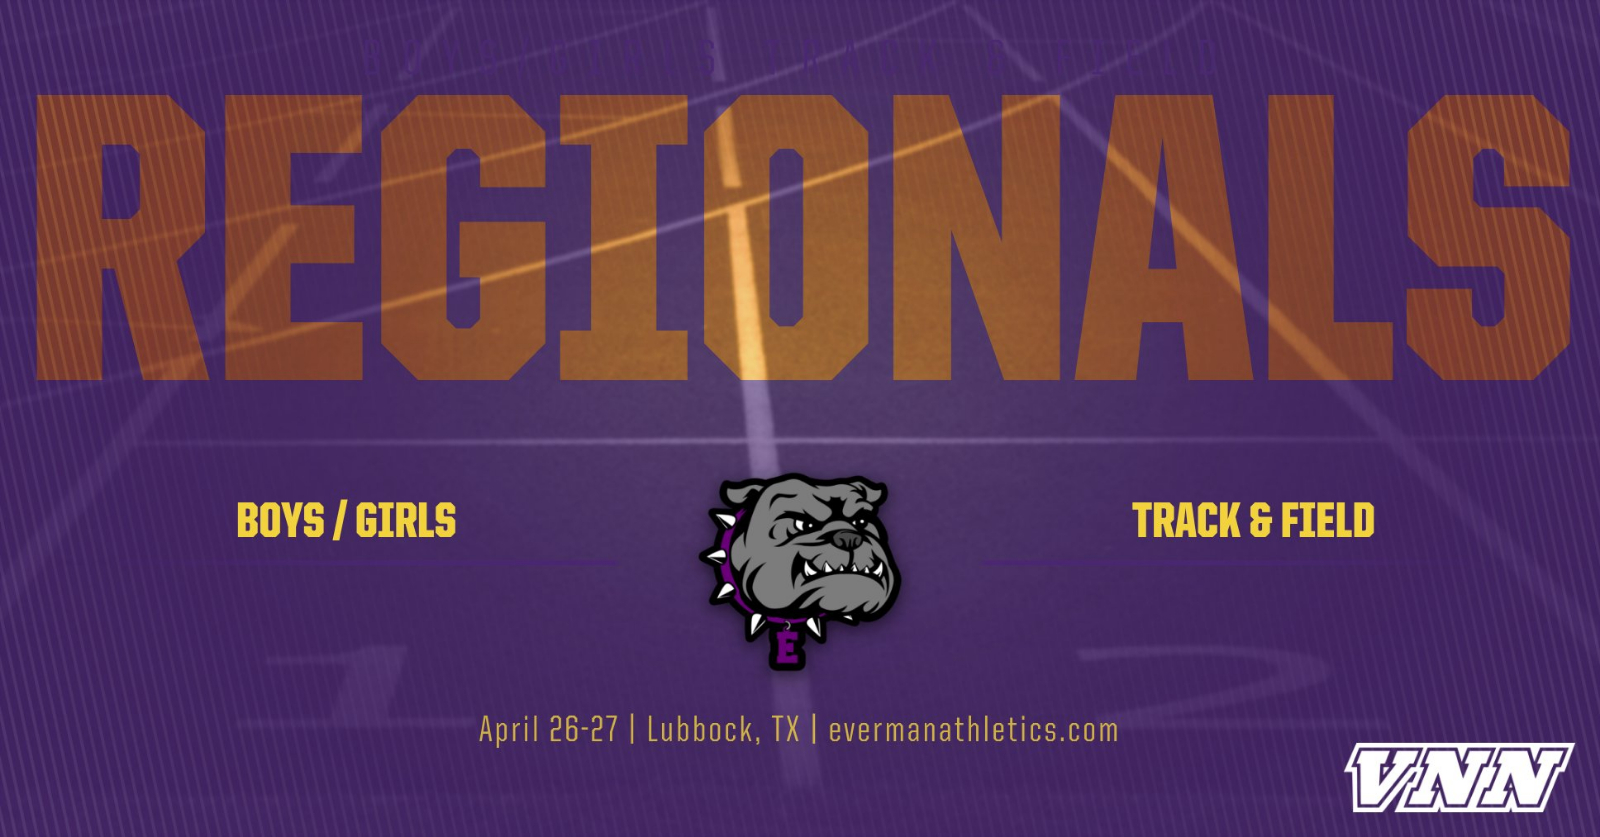 Regional Track & Field Schedule: April 26th & 27th (Lubbock)